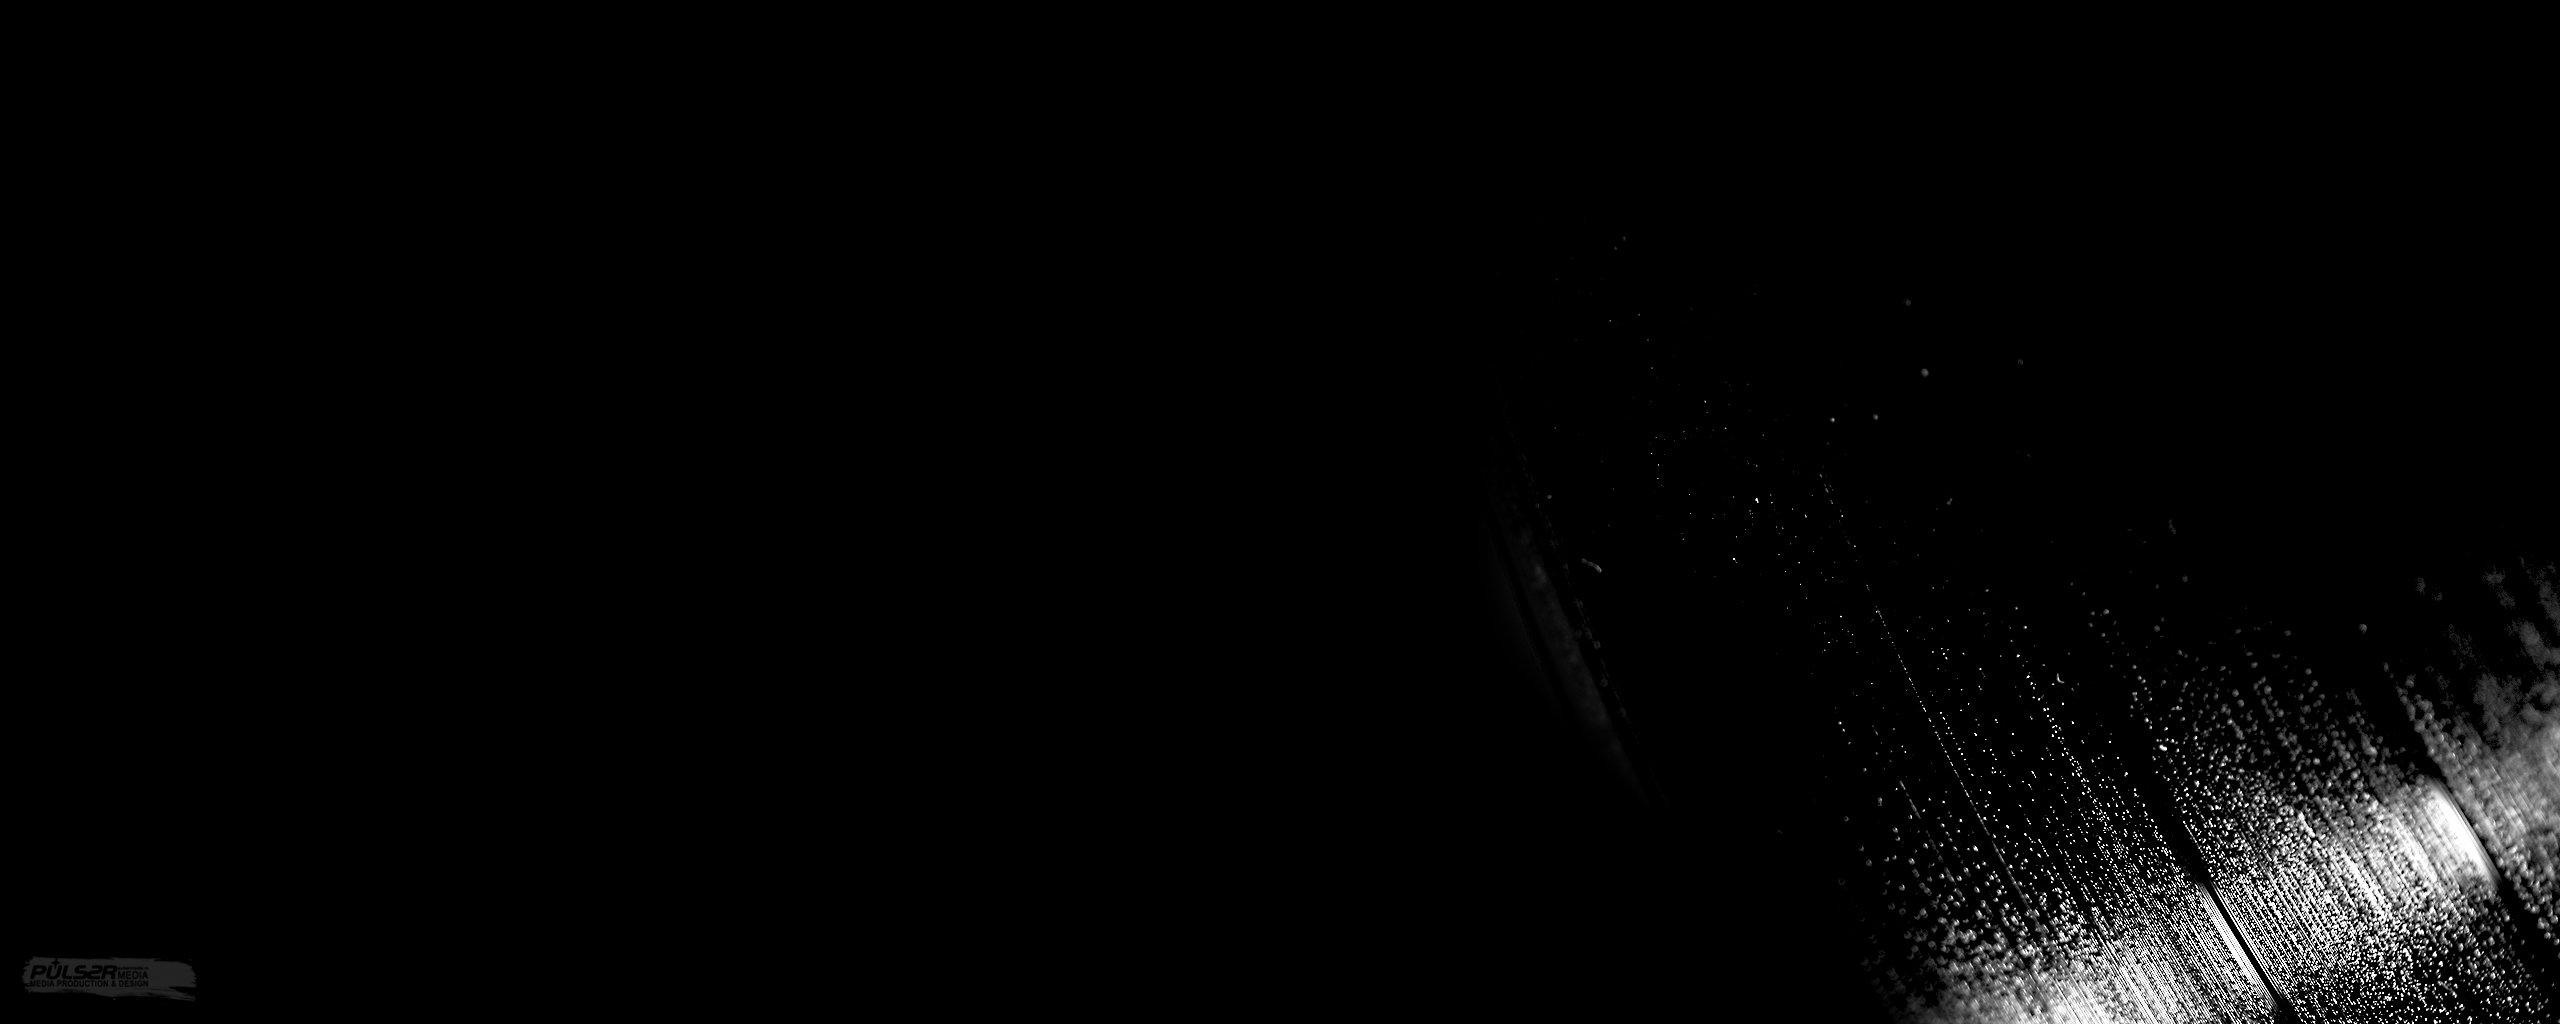 Free Download Black Screen Wallpaper Wallpapers Hd Fine 2560x1024 For Your Desktop Mobile Tablet Explore 49 Black Screen Wallpaper Black Pc Wallpaper Cool Black Background Wallpaper Black Wallpaper For Phone